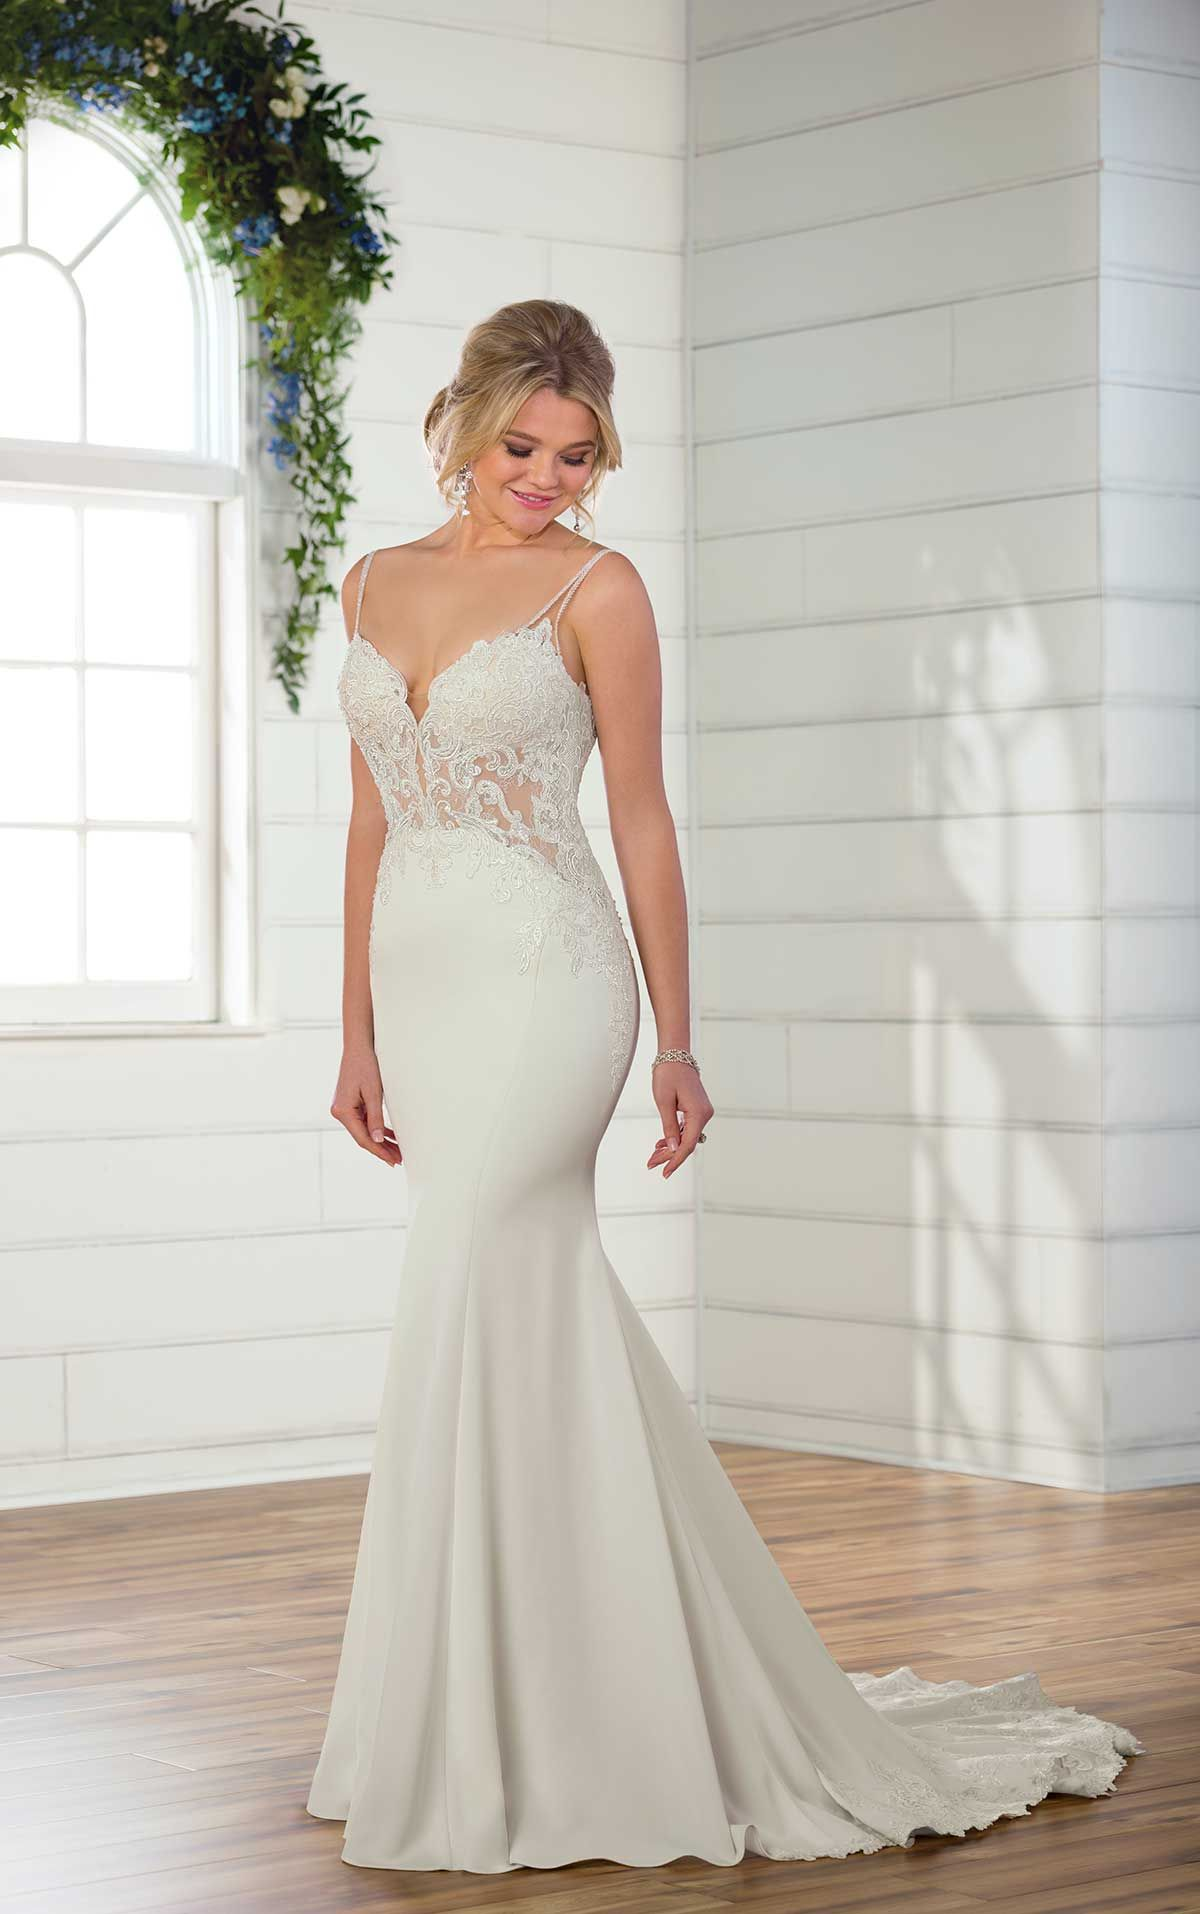 Sheer wedding dress  Beaded Sheer Wedding Dress  boom  Pinterest  Sheer wedding dress